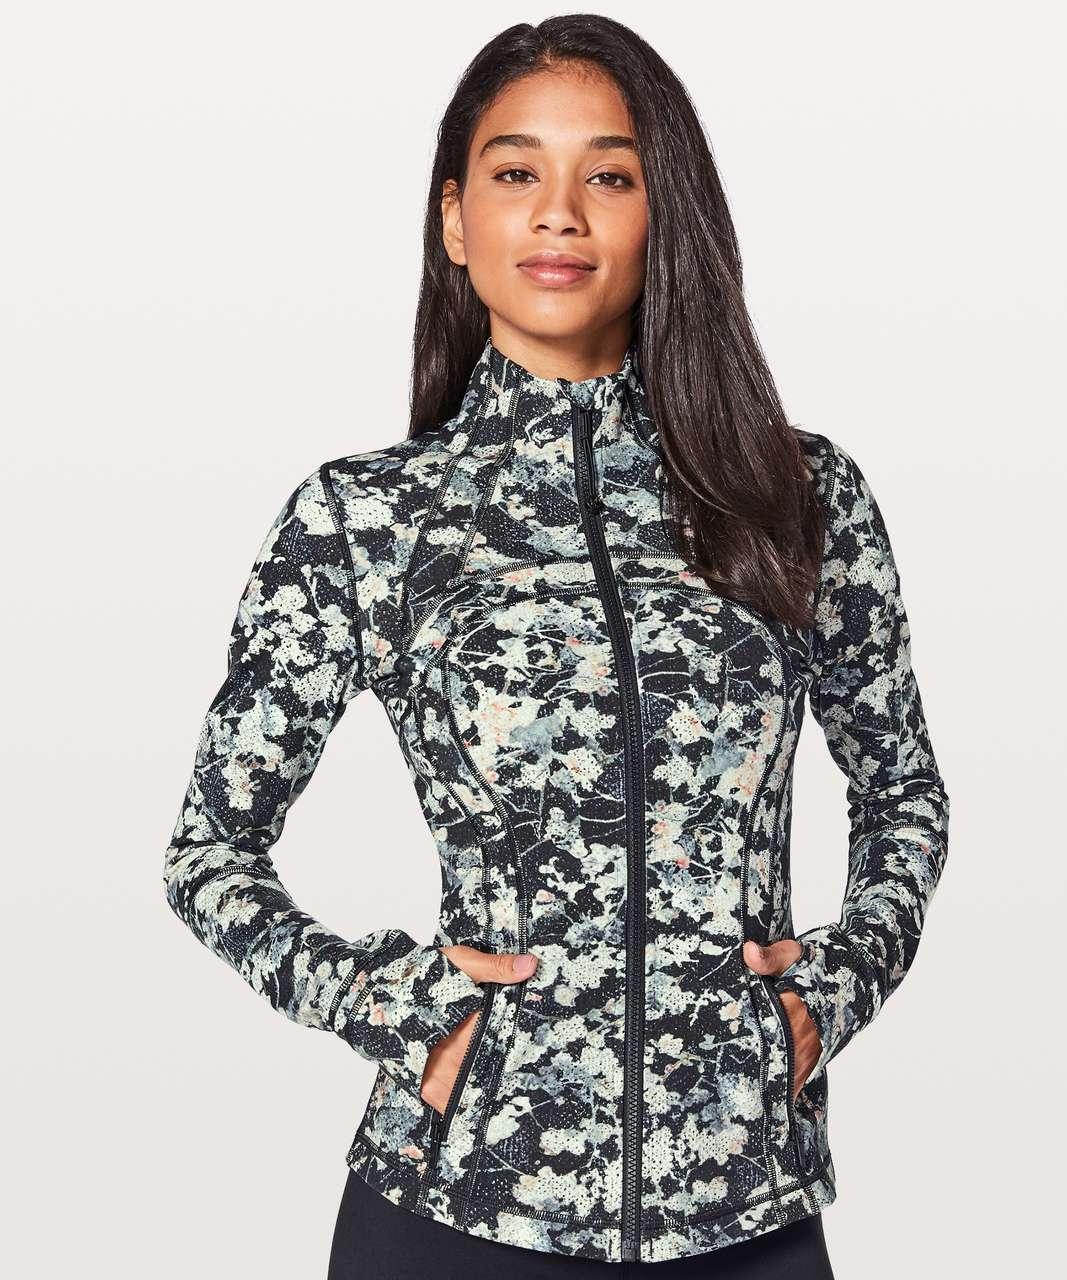 Lululemon Define Jacket - Spring Bloom Multi